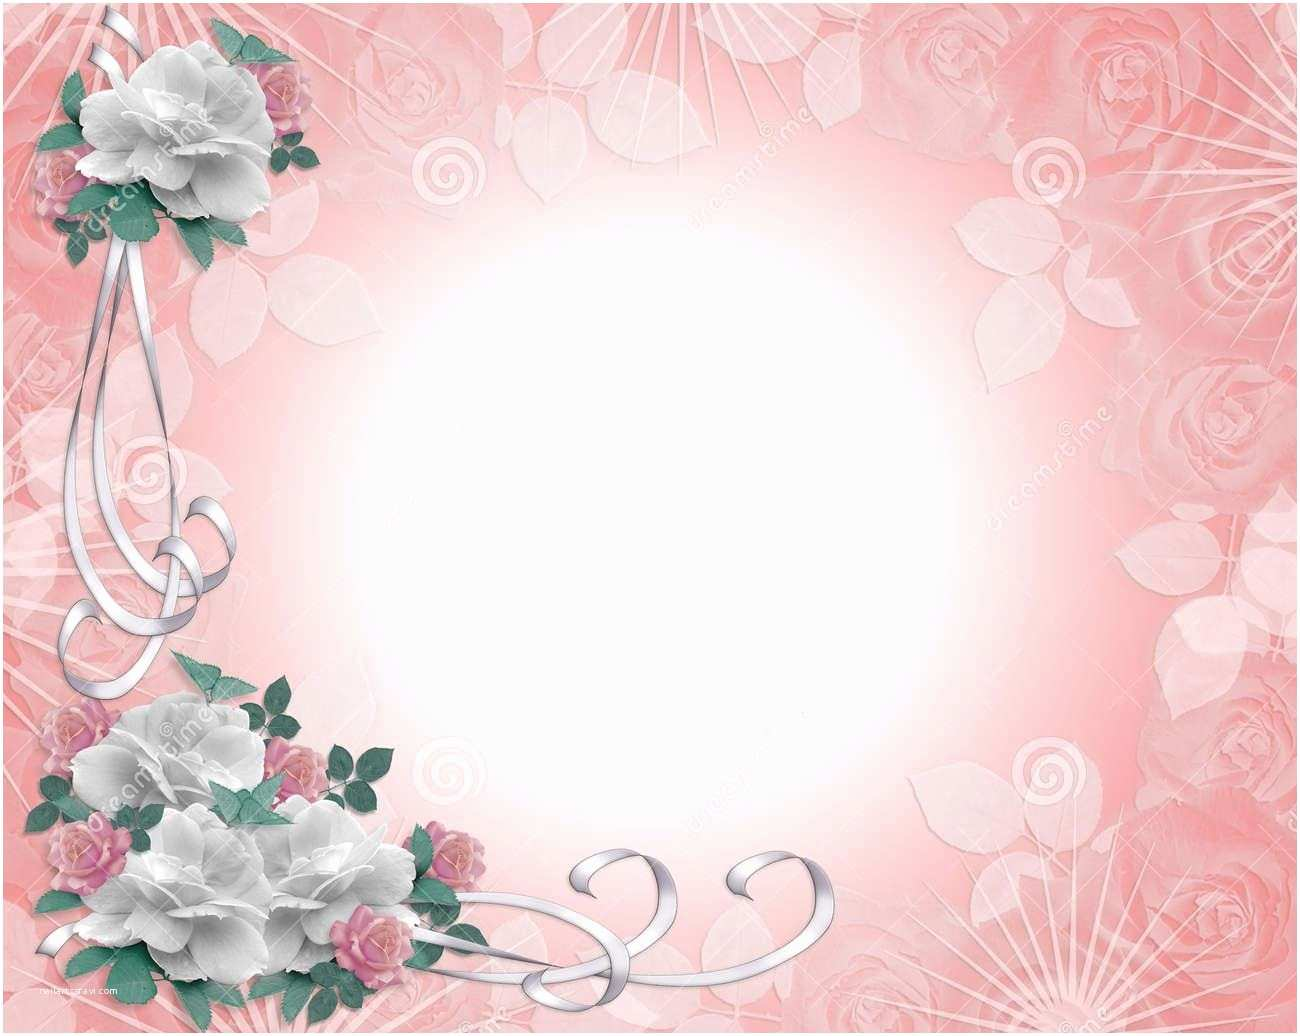 Wedding Invitation Designs Pink Wedding Invitation Backgrounds